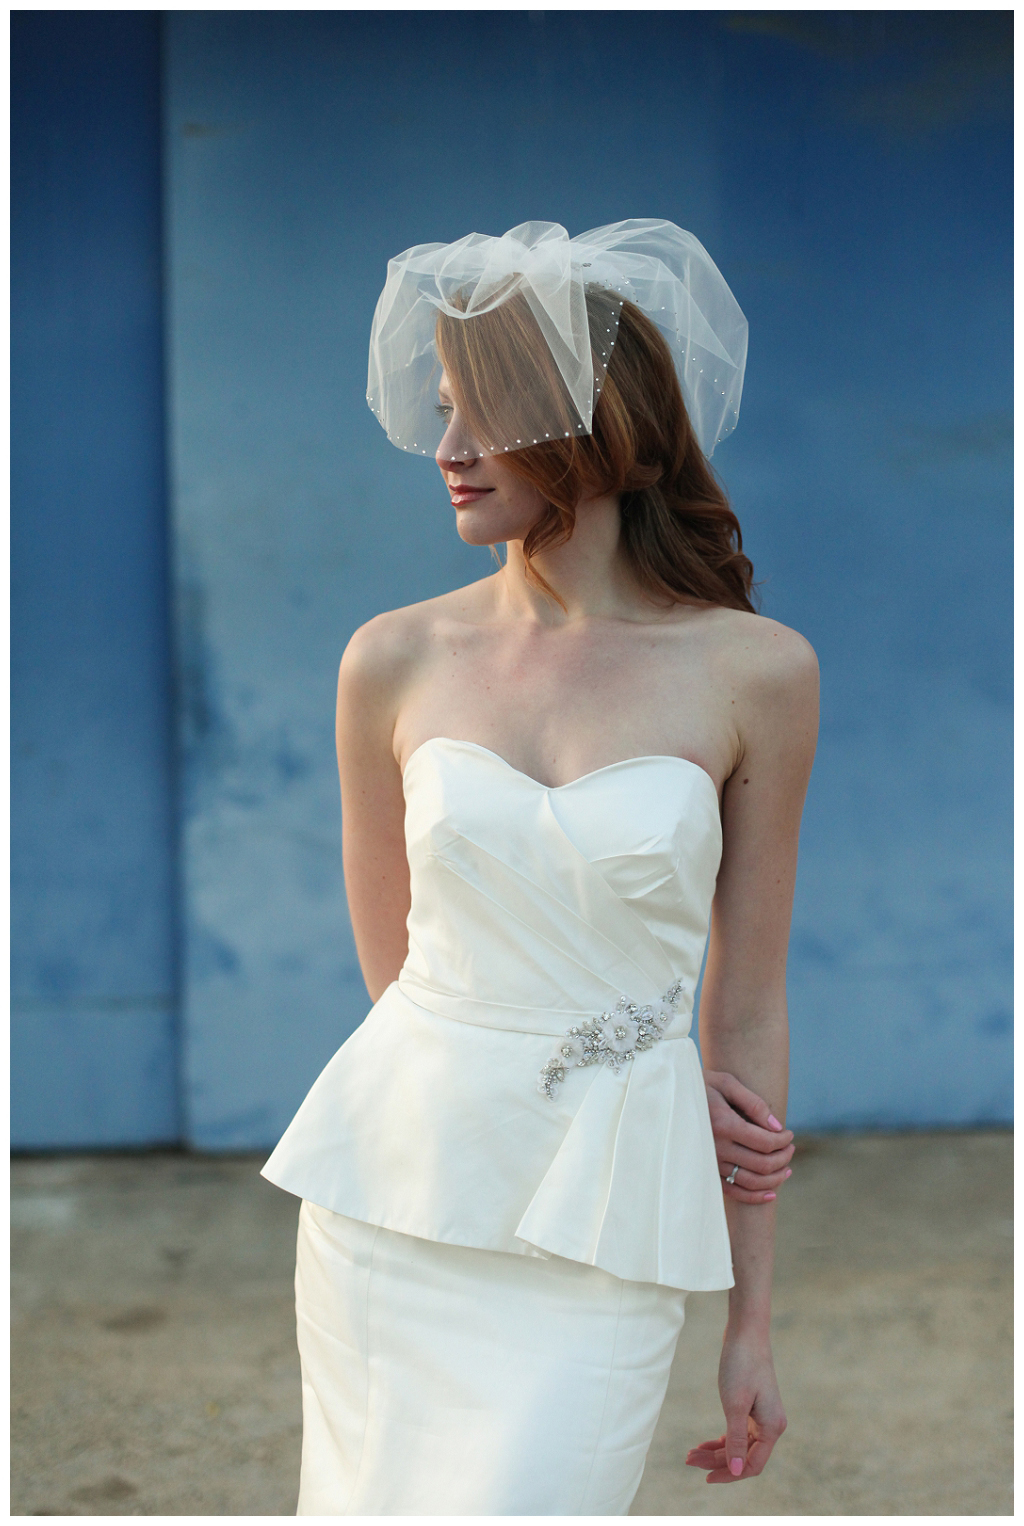 Salisbury NC Wedding Photographer: Bellissima Bridal Fashion Shoot ...